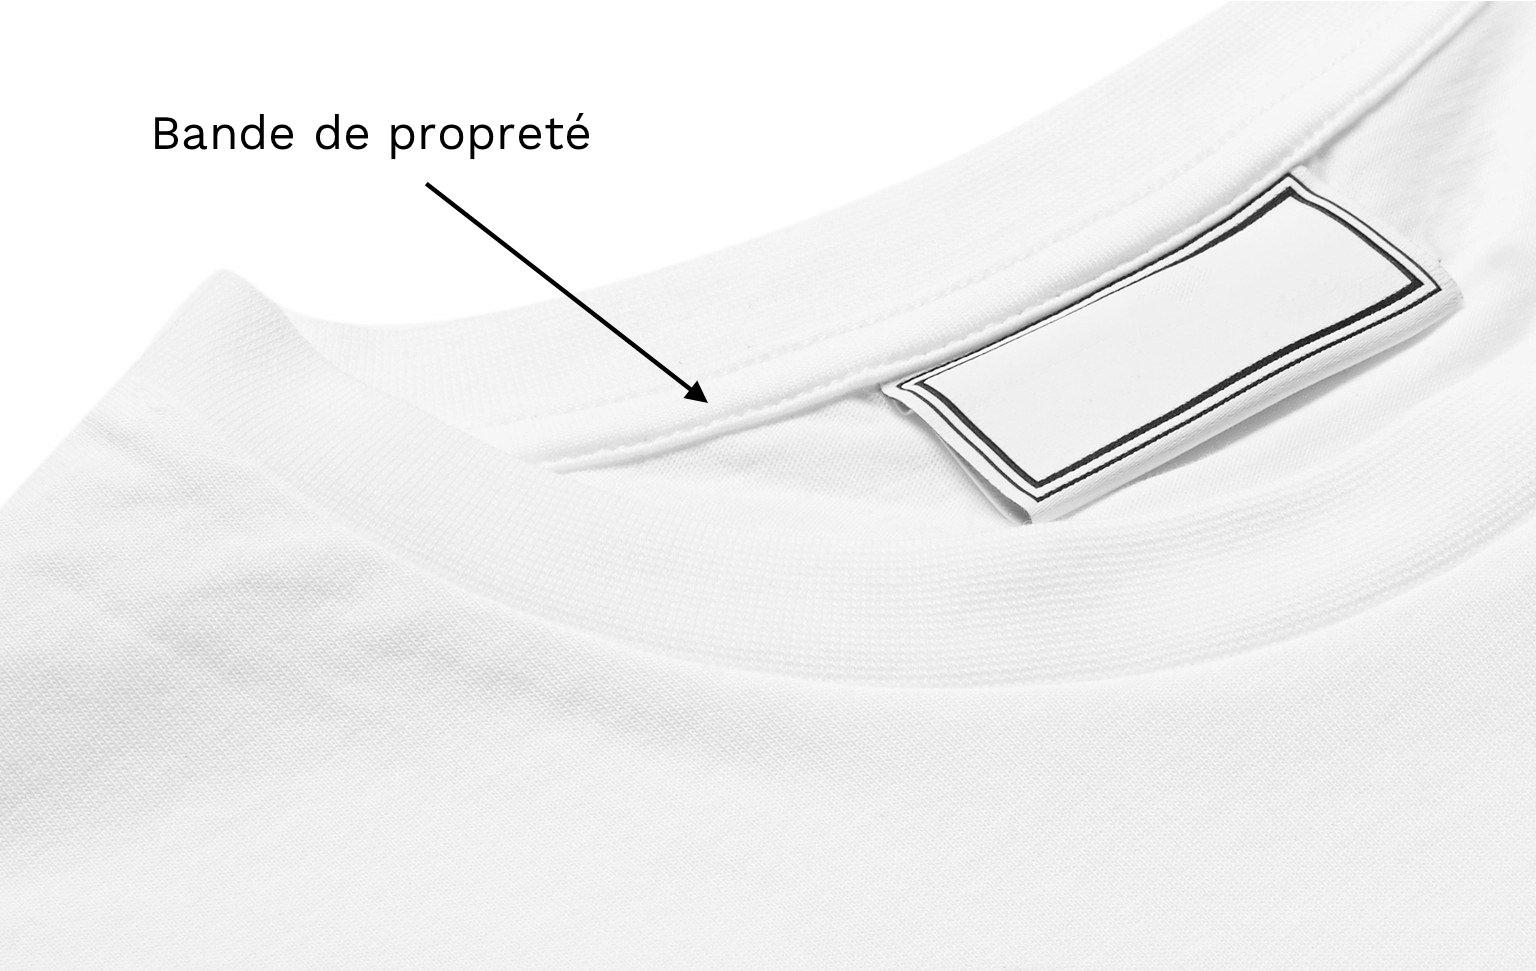 bande de proprete t-shirt